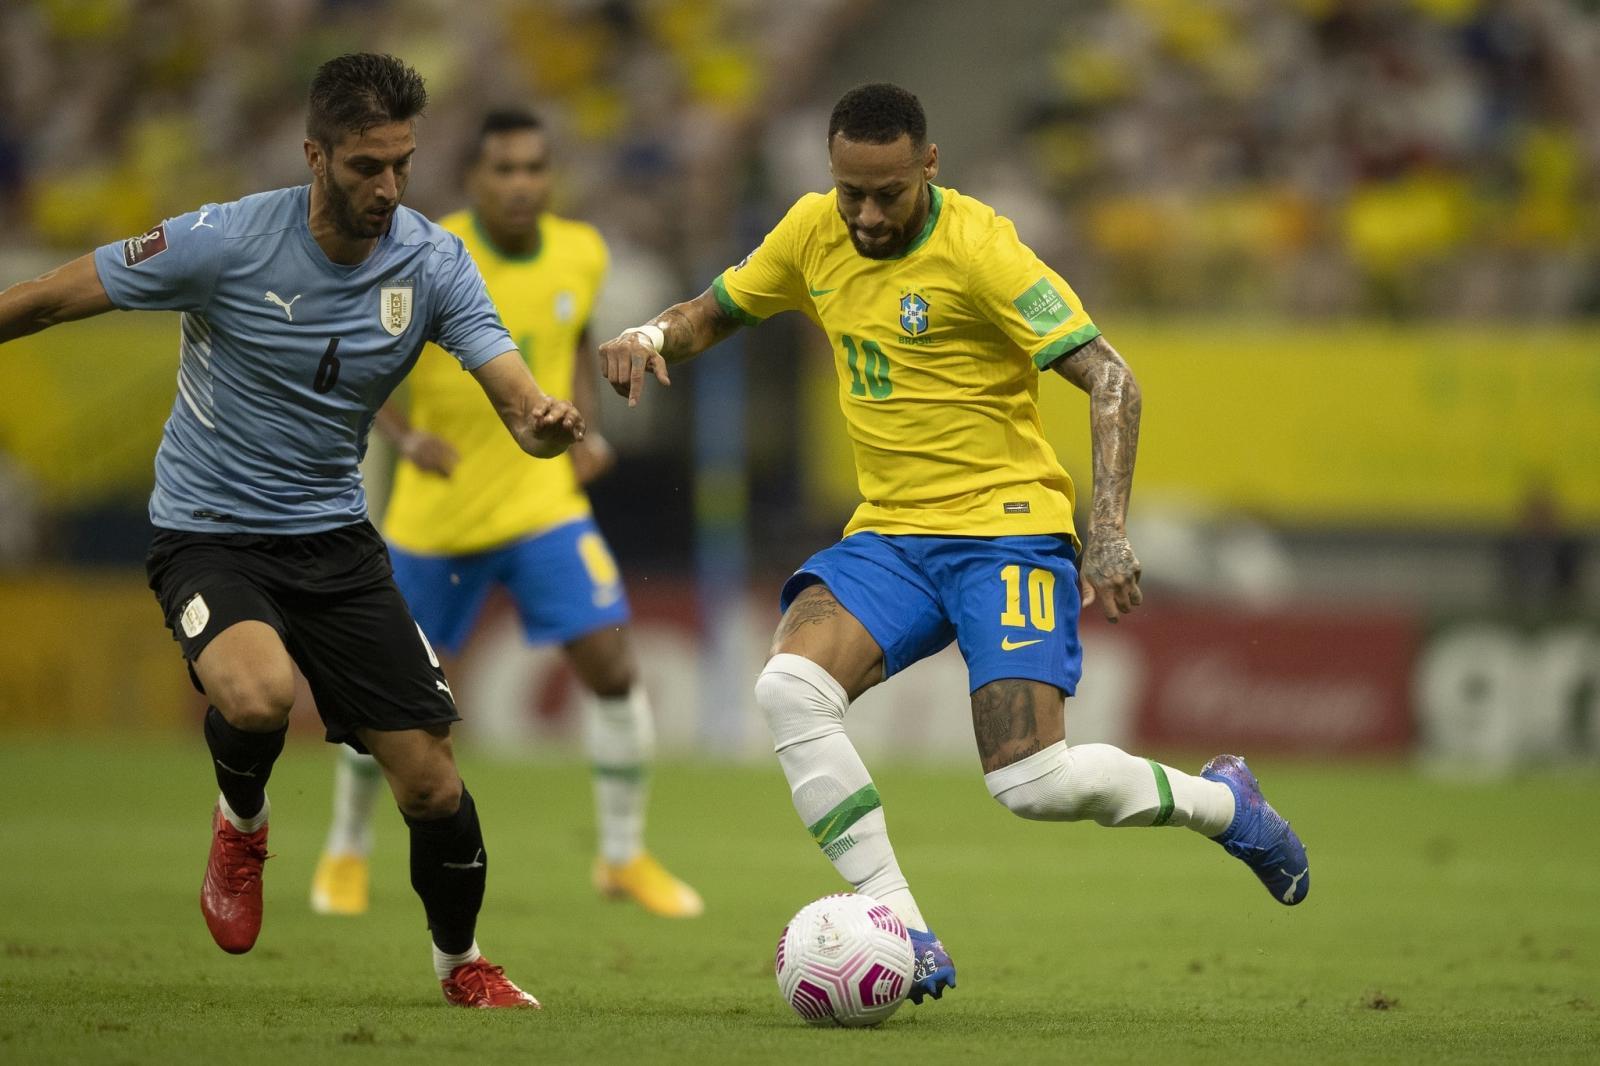 Tite pode garantir Brasil na Copa pela segunda vez seguida na casa do Corinthians